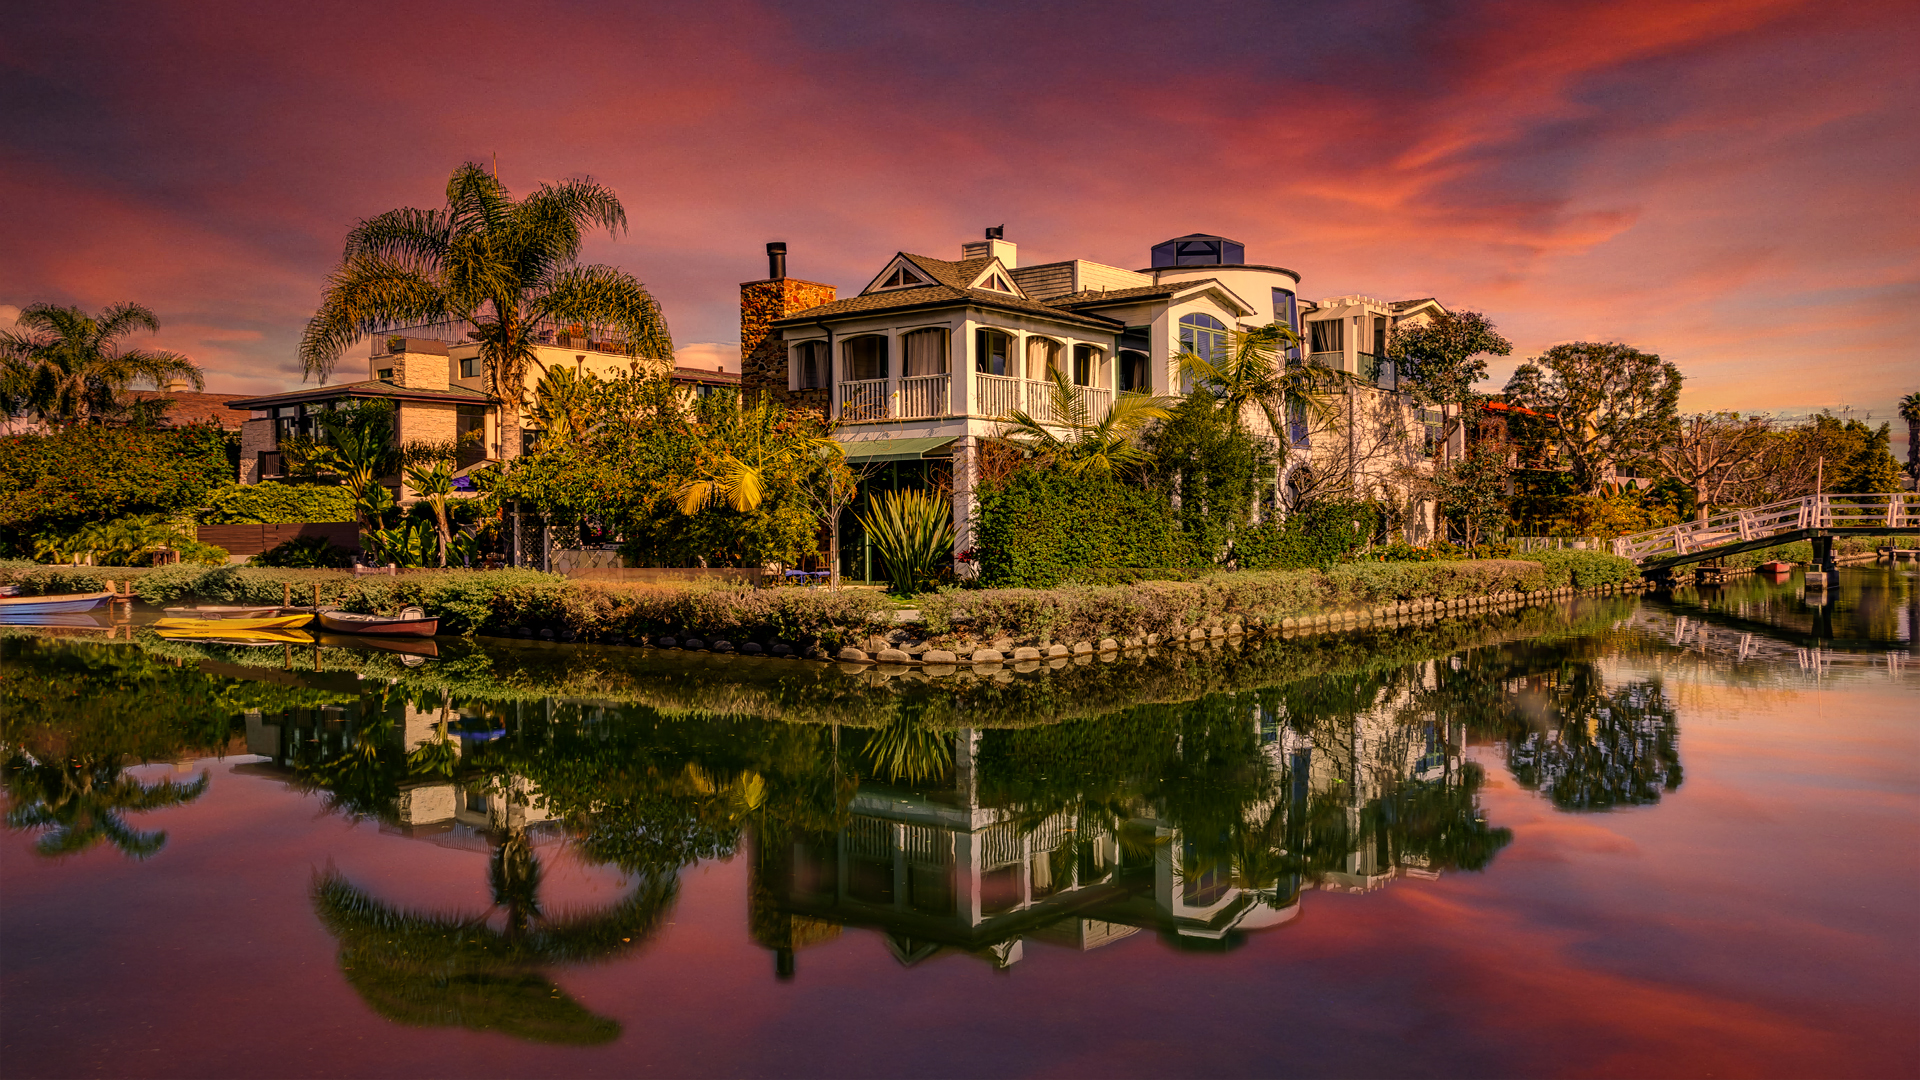 Venice Beach CanalsSunset1 2-14-18